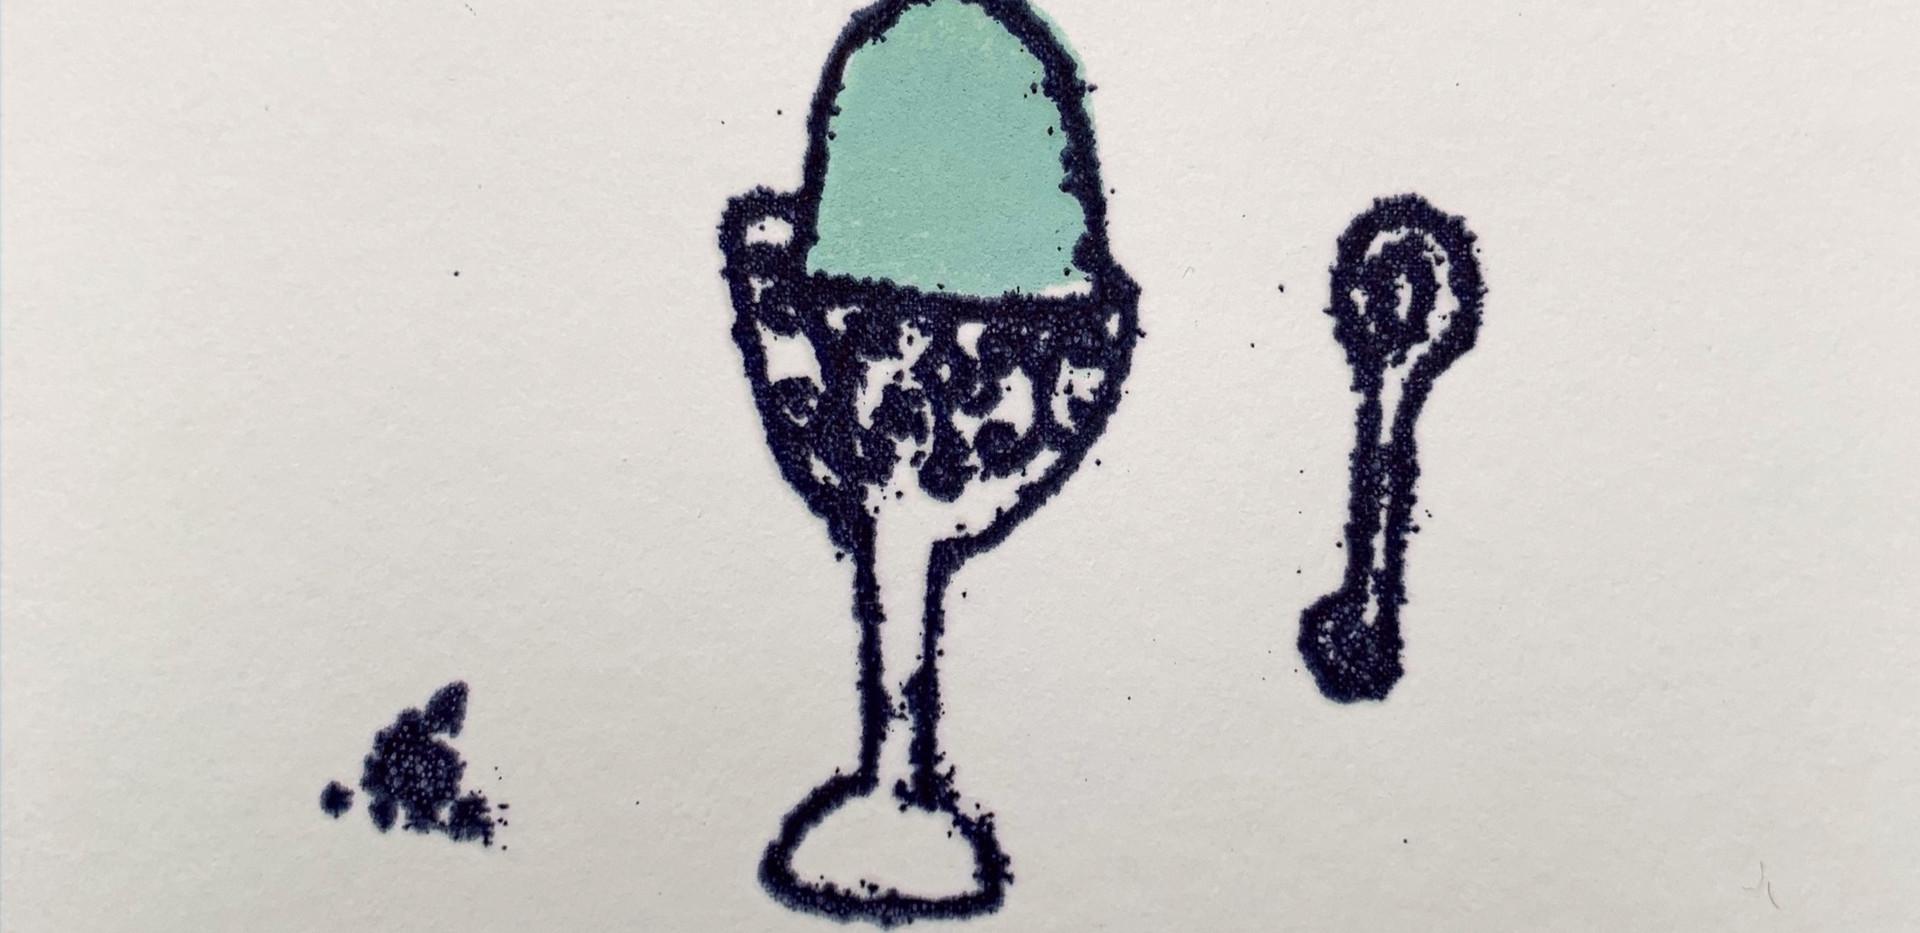 Blue Egg, small